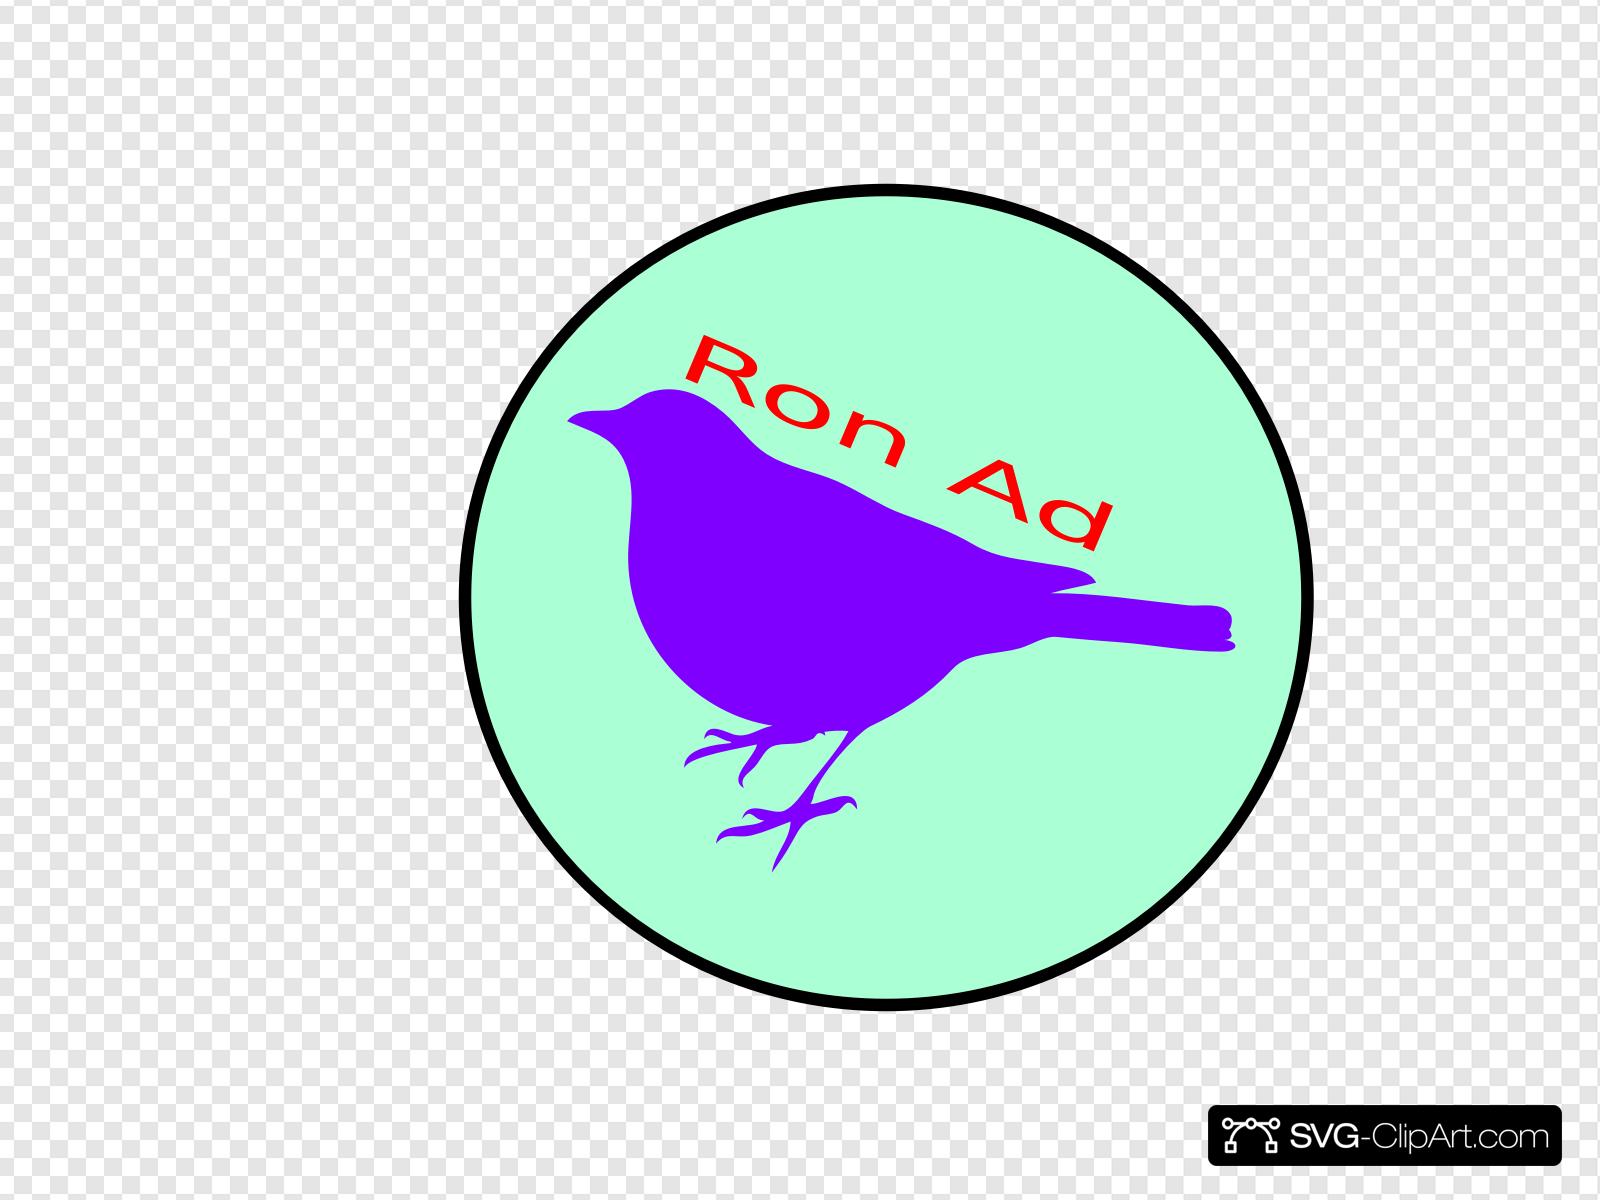 Bird Adventure Logo Clip art, Icon and SVG.